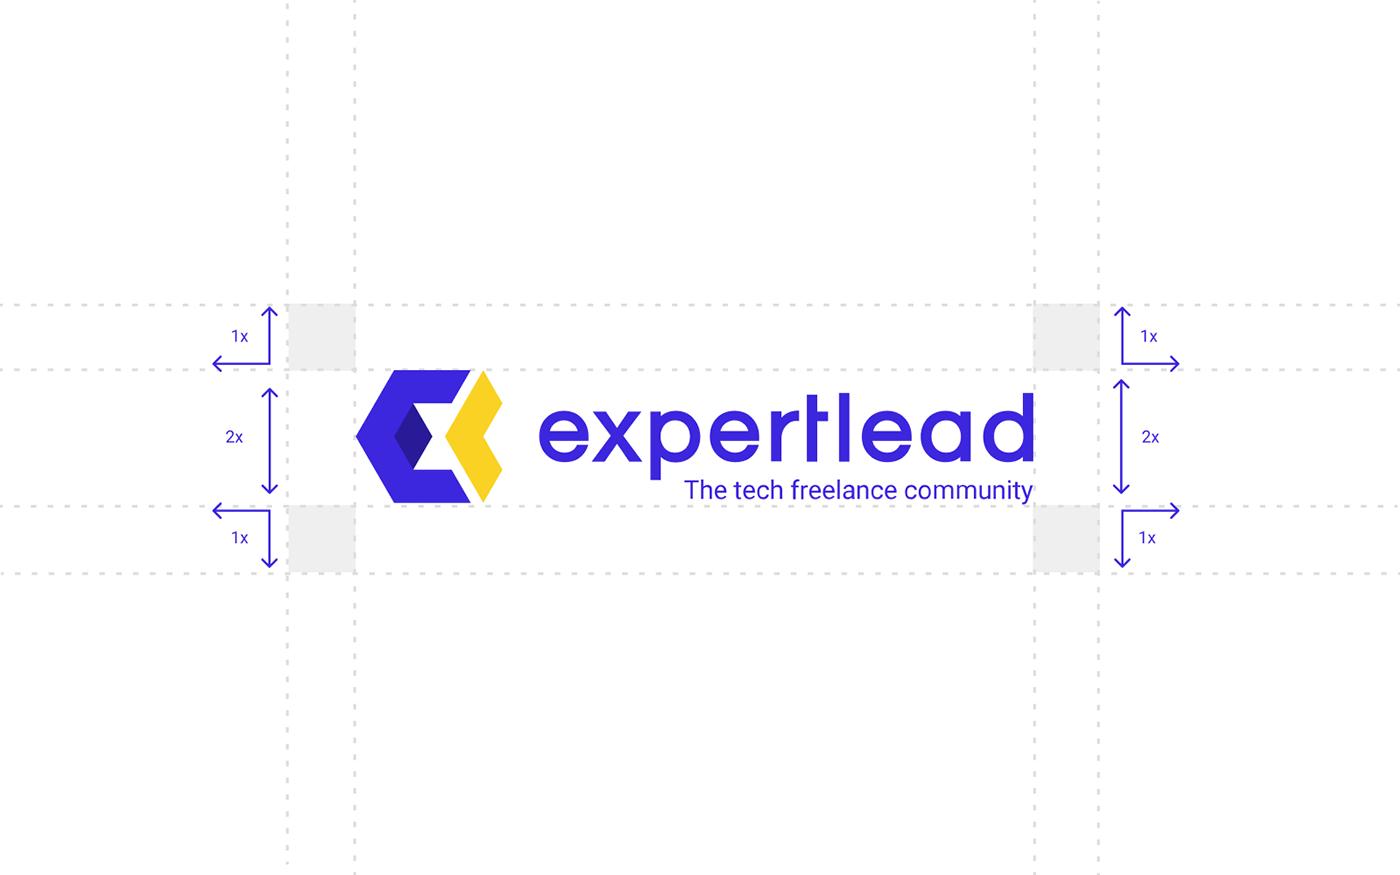 banner brand corporate expertlead identity presentation visual design